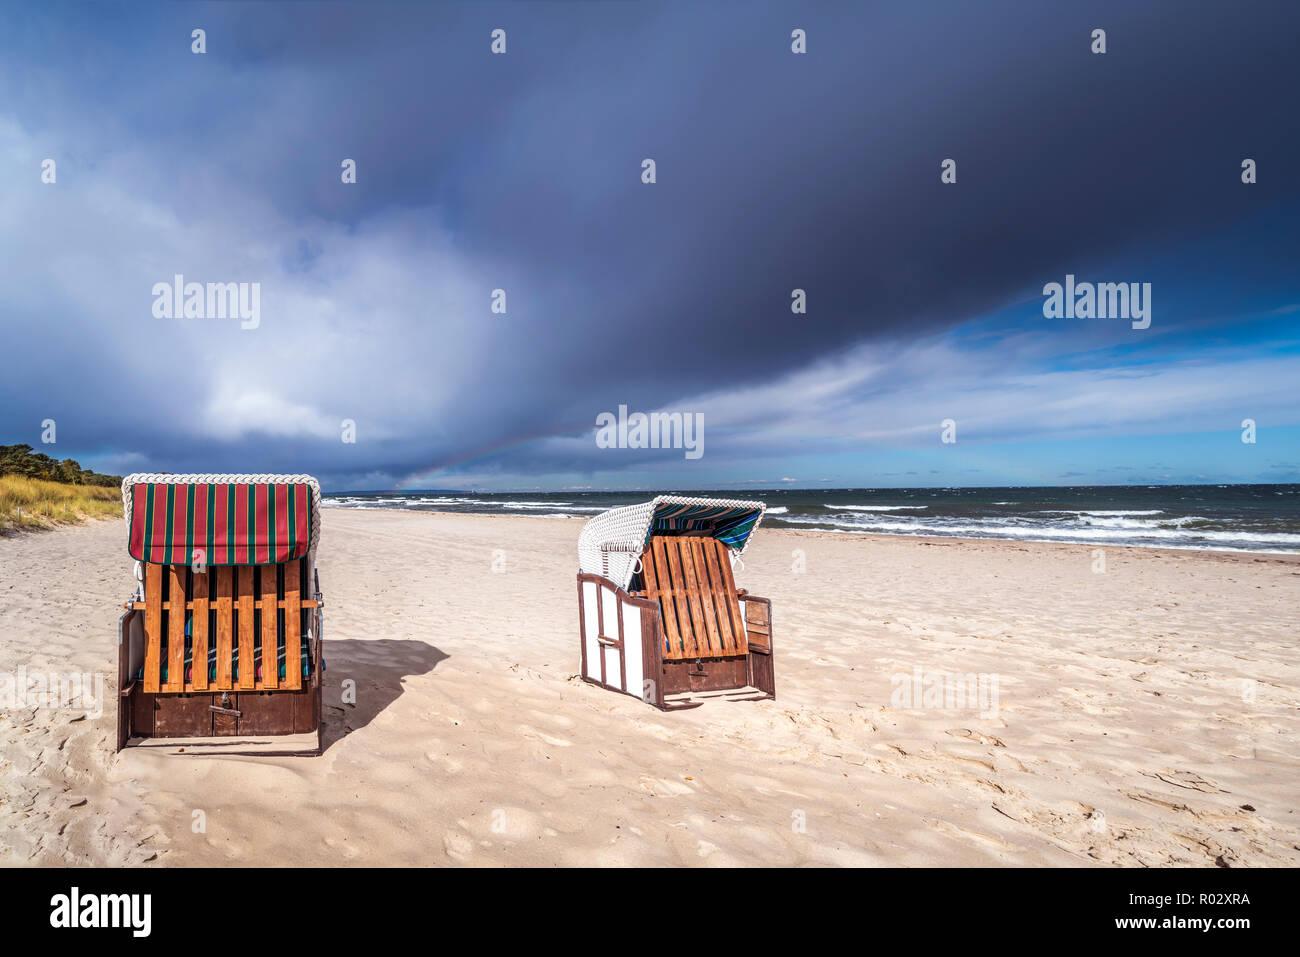 Beach chairs on the island of Rügen, Sellin/Baabe, Germany | Strandkörbe auf der Insel Rügen, Sellin/Baabe - Stock Image